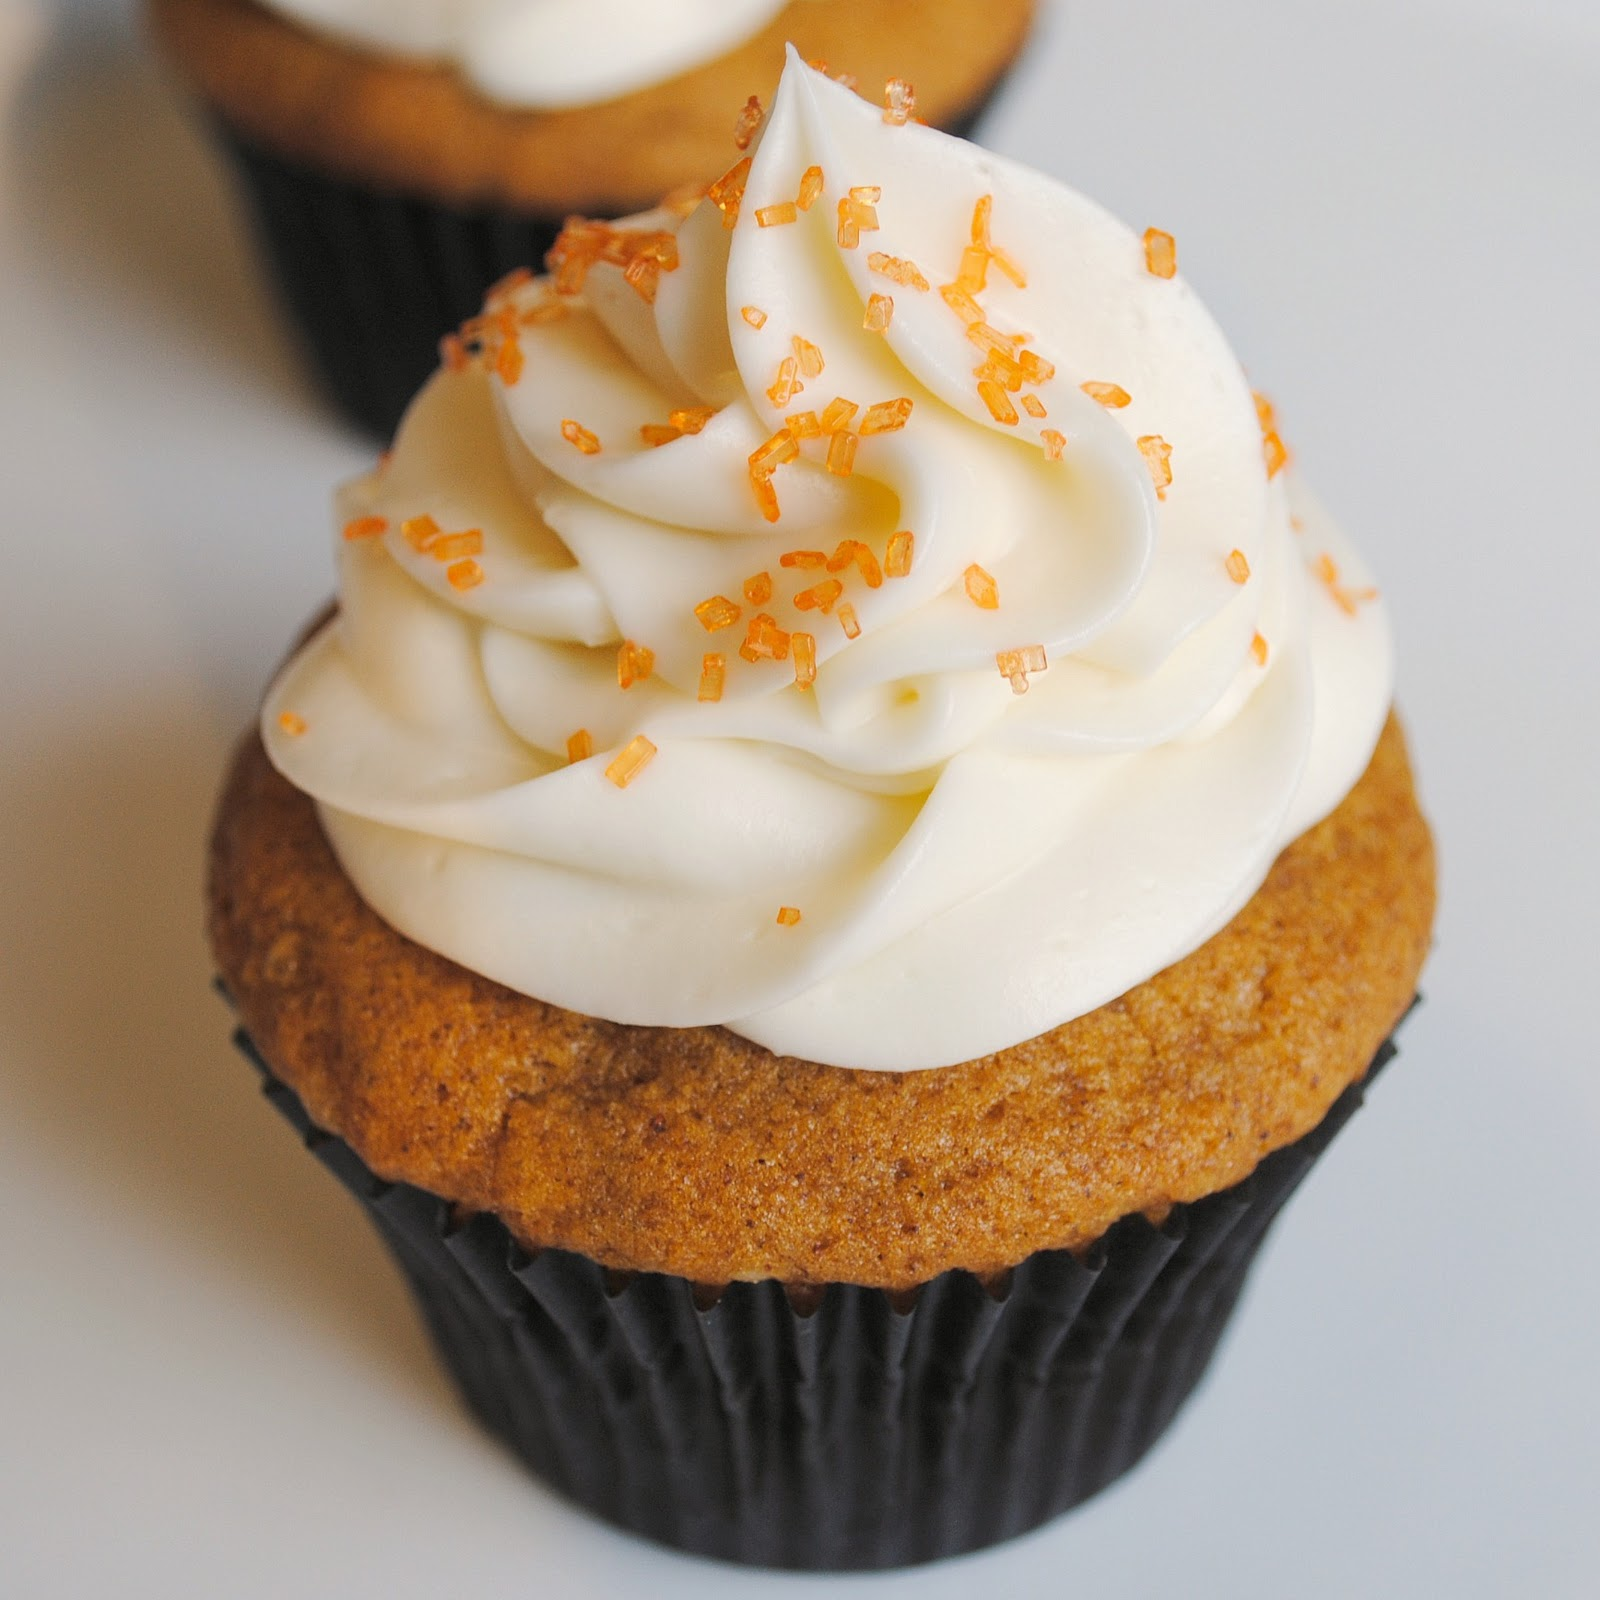 Homemade By Holman: A Fall Favorite: Pumpkin Cupcakes